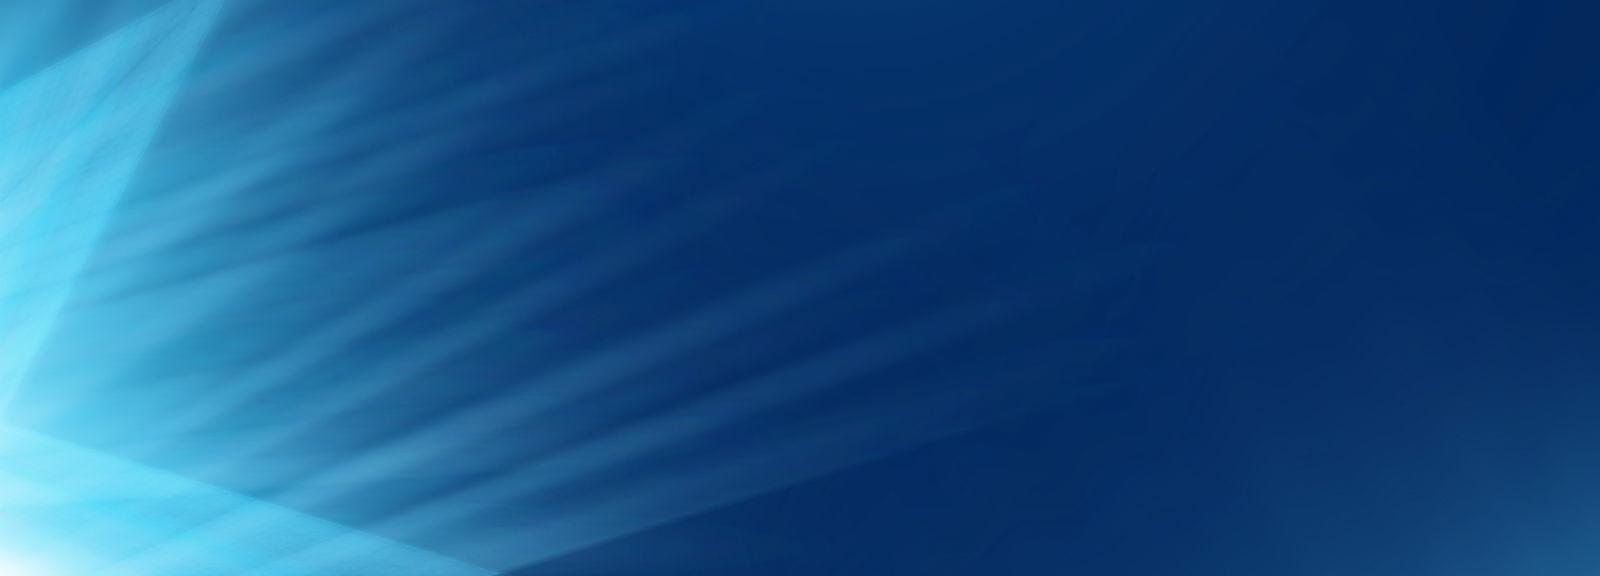 blue-background1